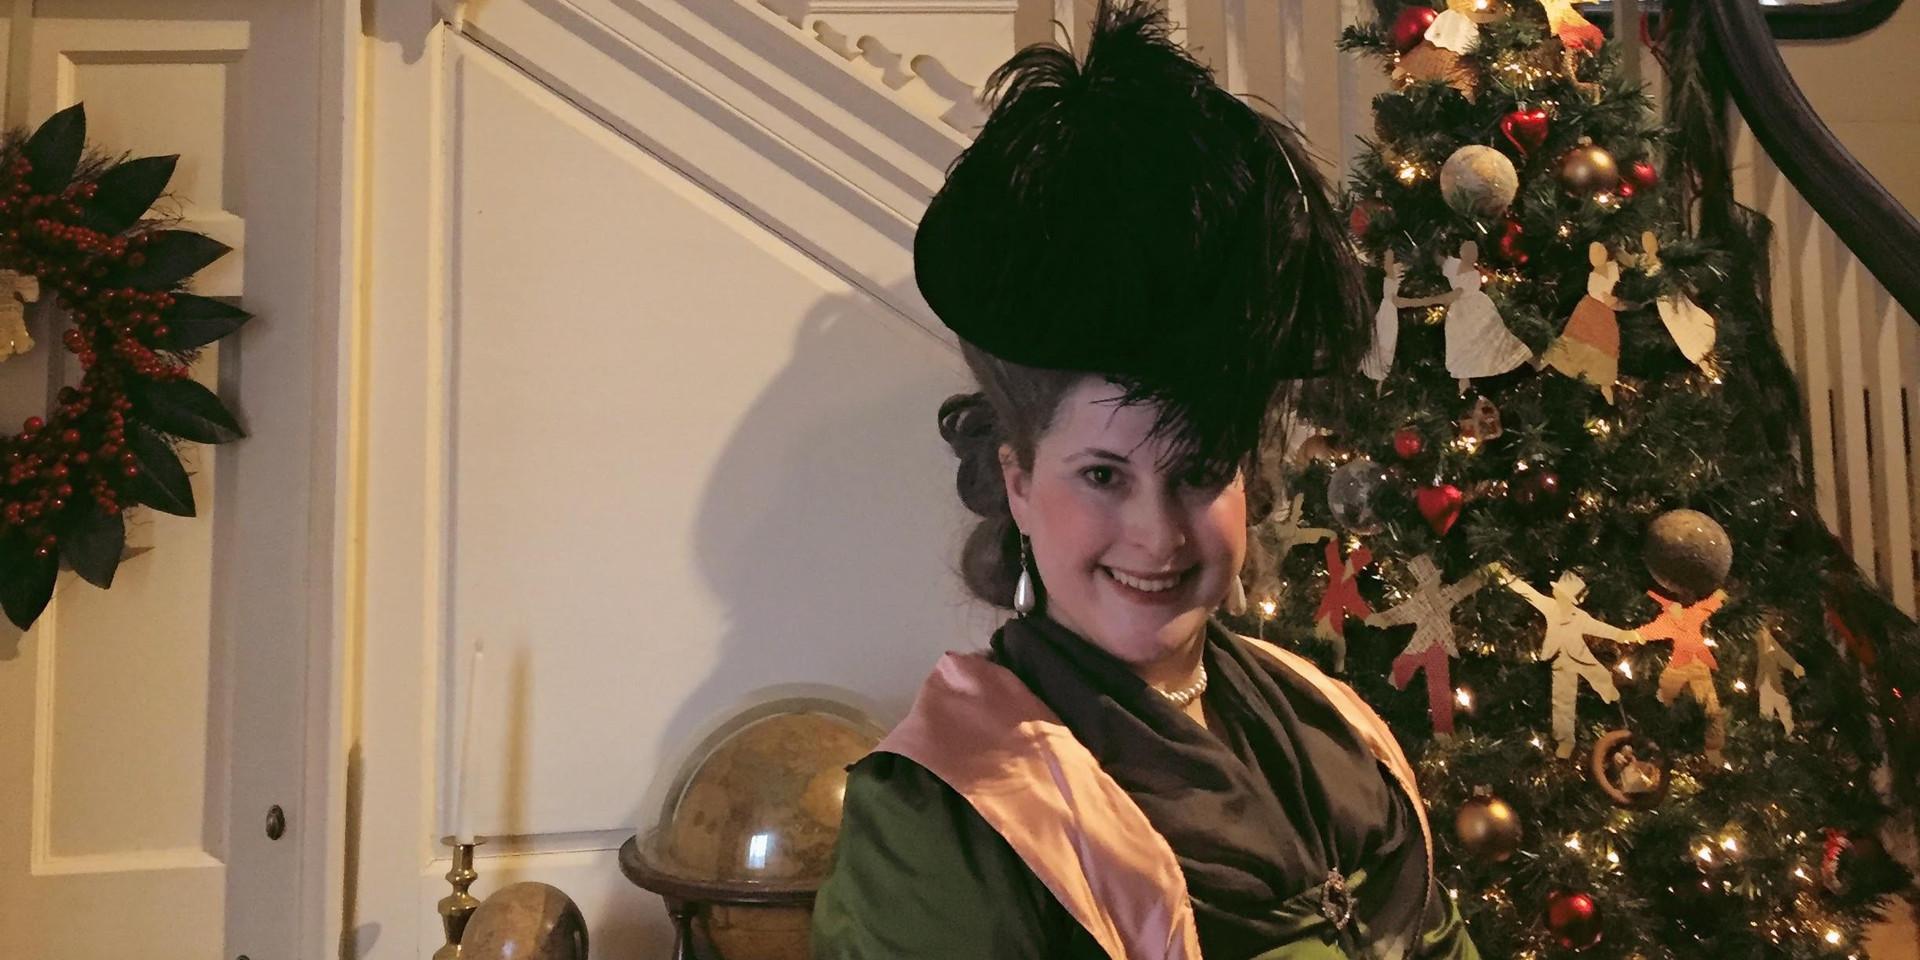 Portrayal of Rebecca Franks at Woodford Mansion December 2019